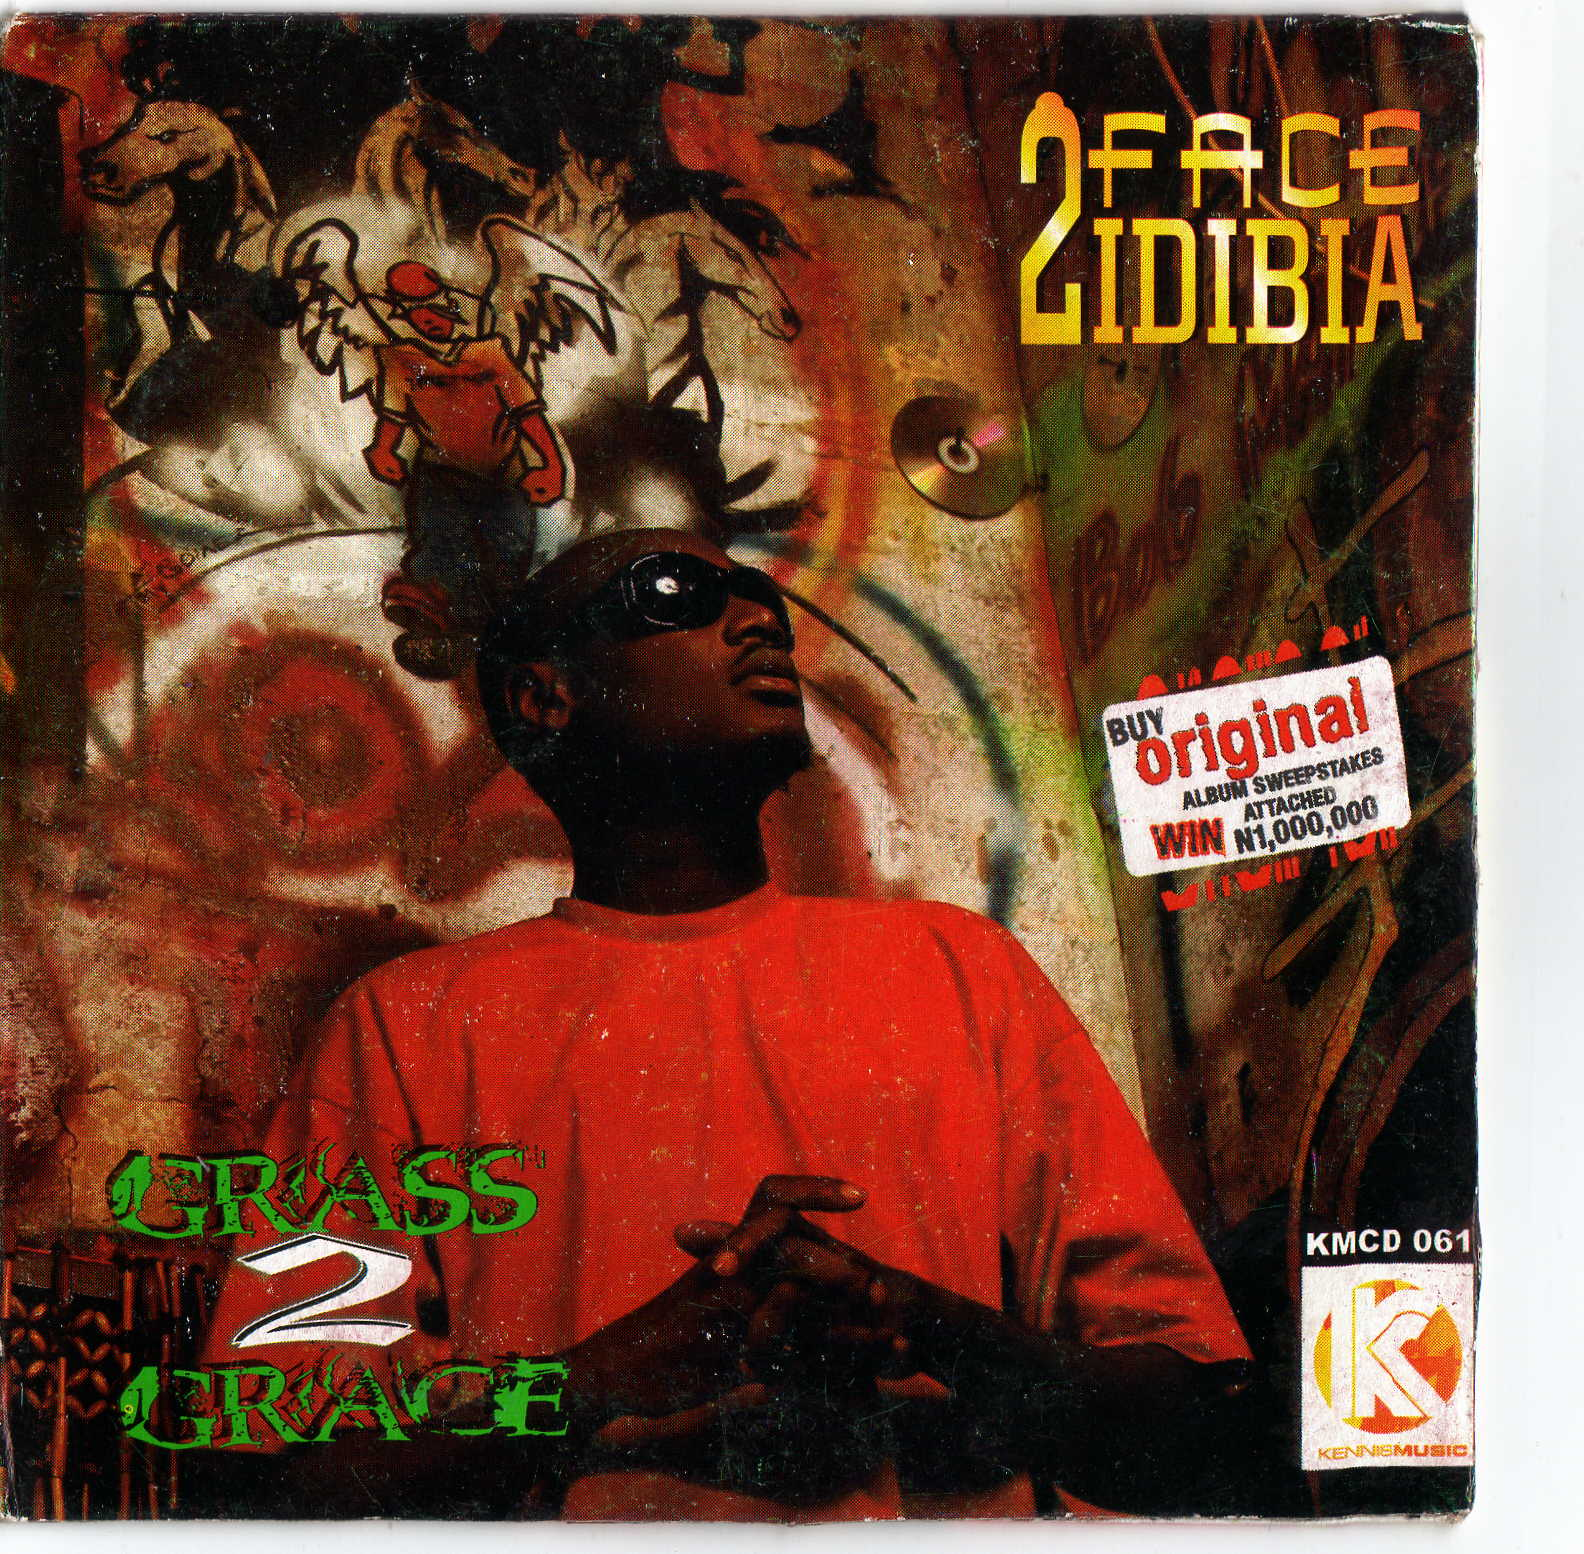 Throwback 2face Idibia